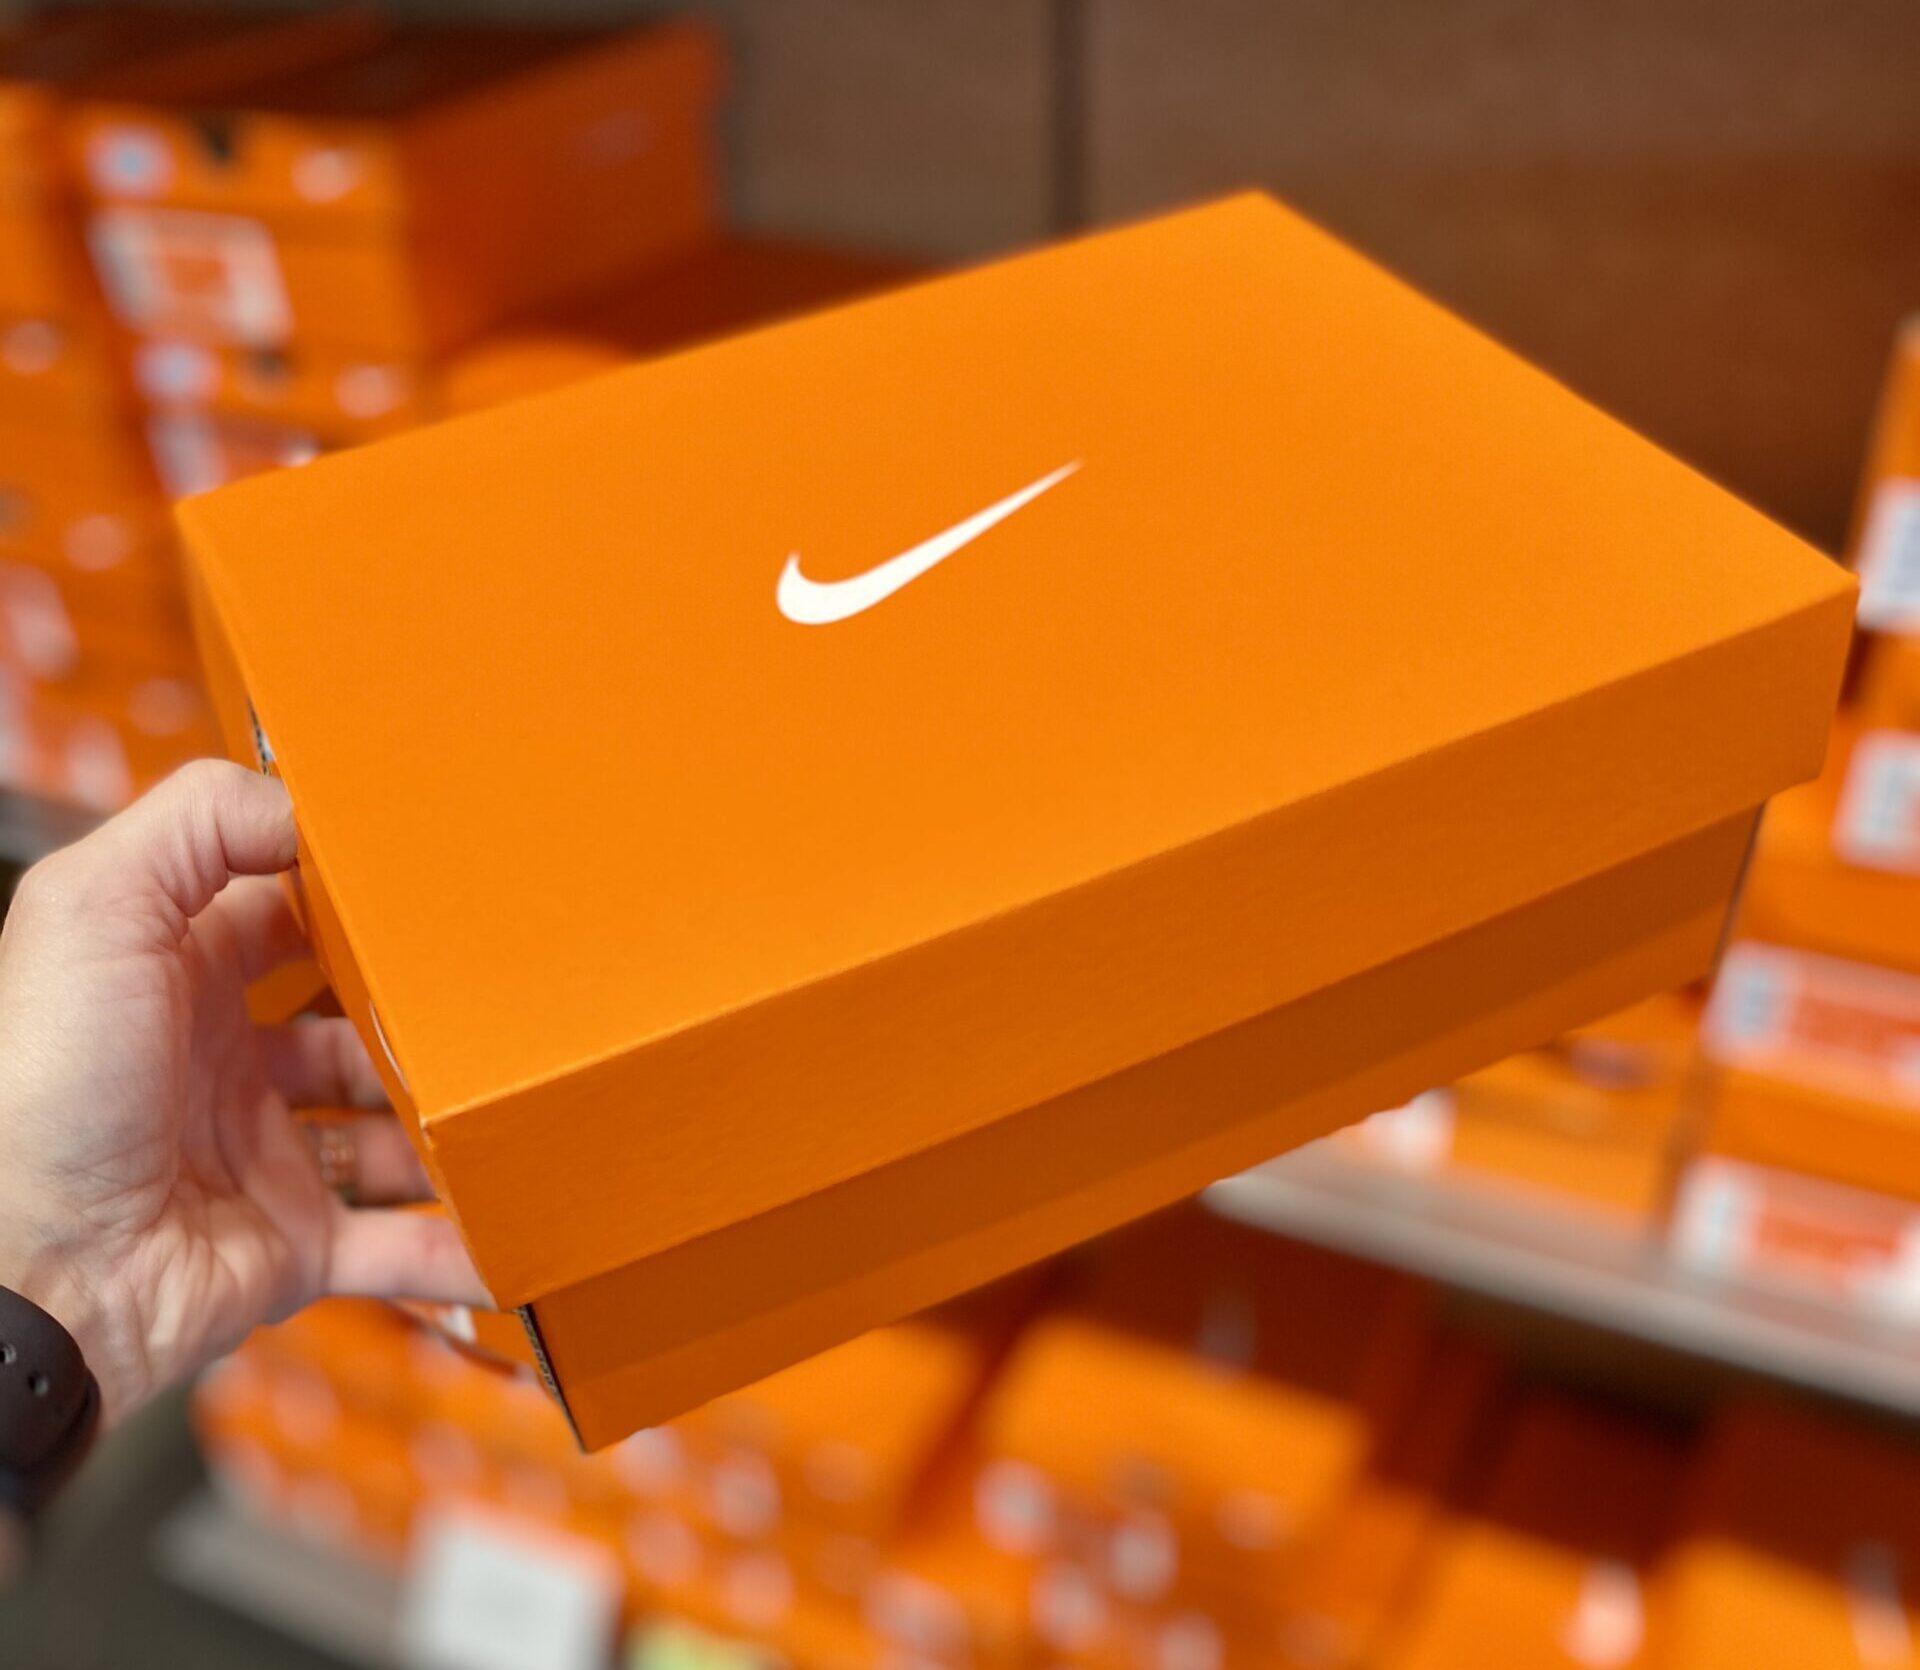 nike box - nike shoes